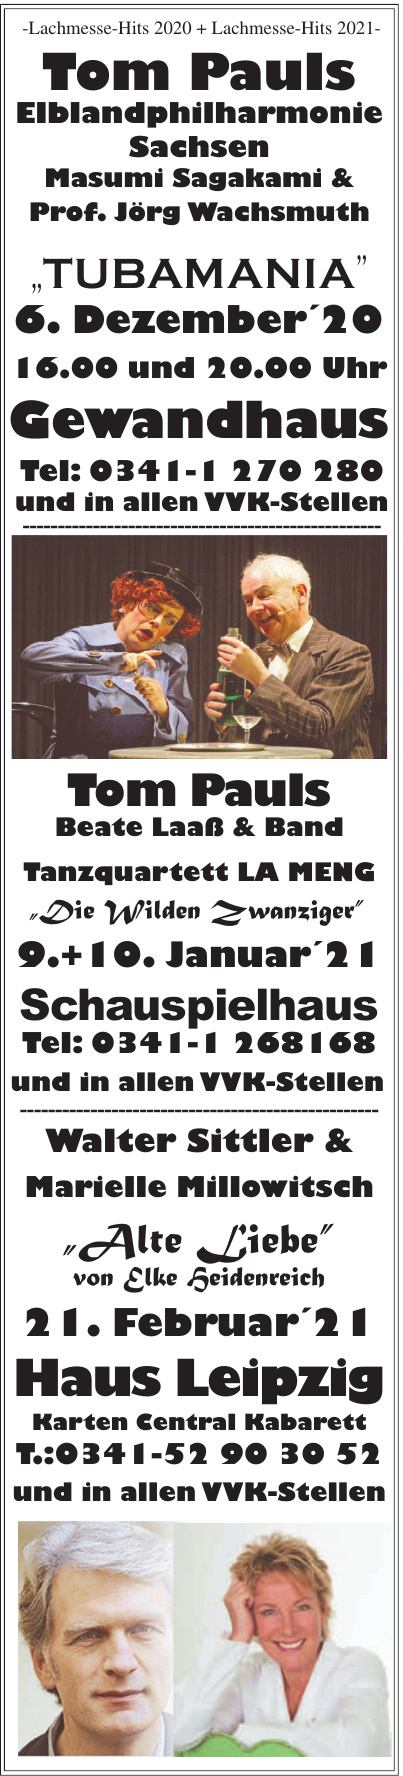 Elblandphilharmonie Sachsen